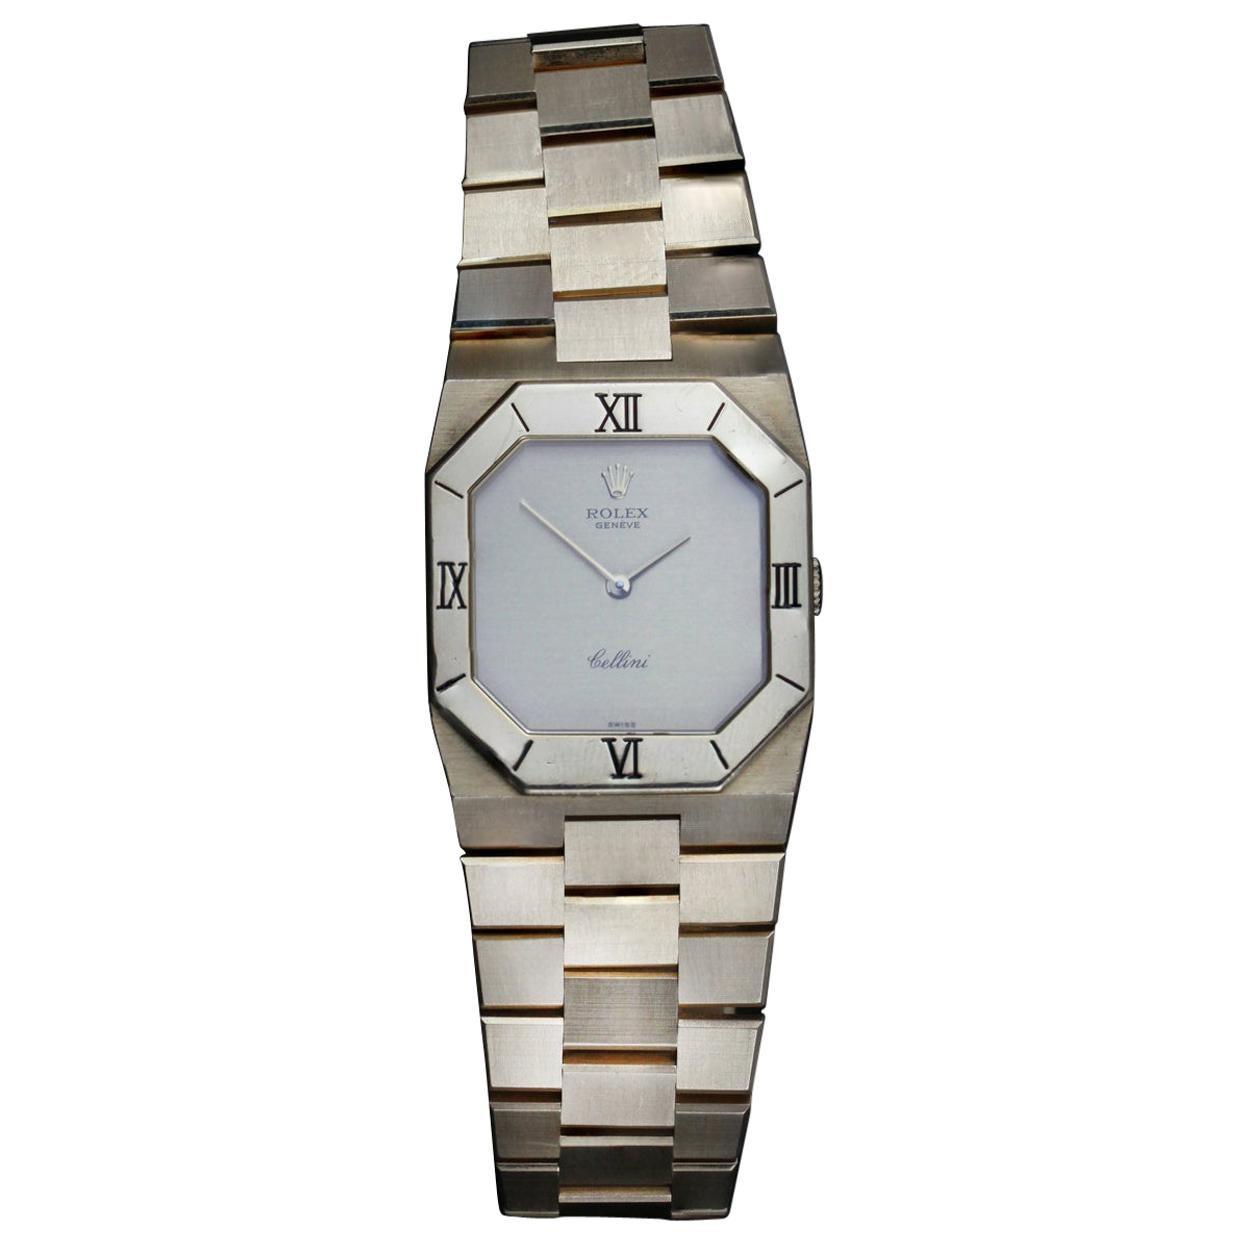 Rolex Cellini Solid 18 Karat Yellow Gold Manual Winding Wristwatch